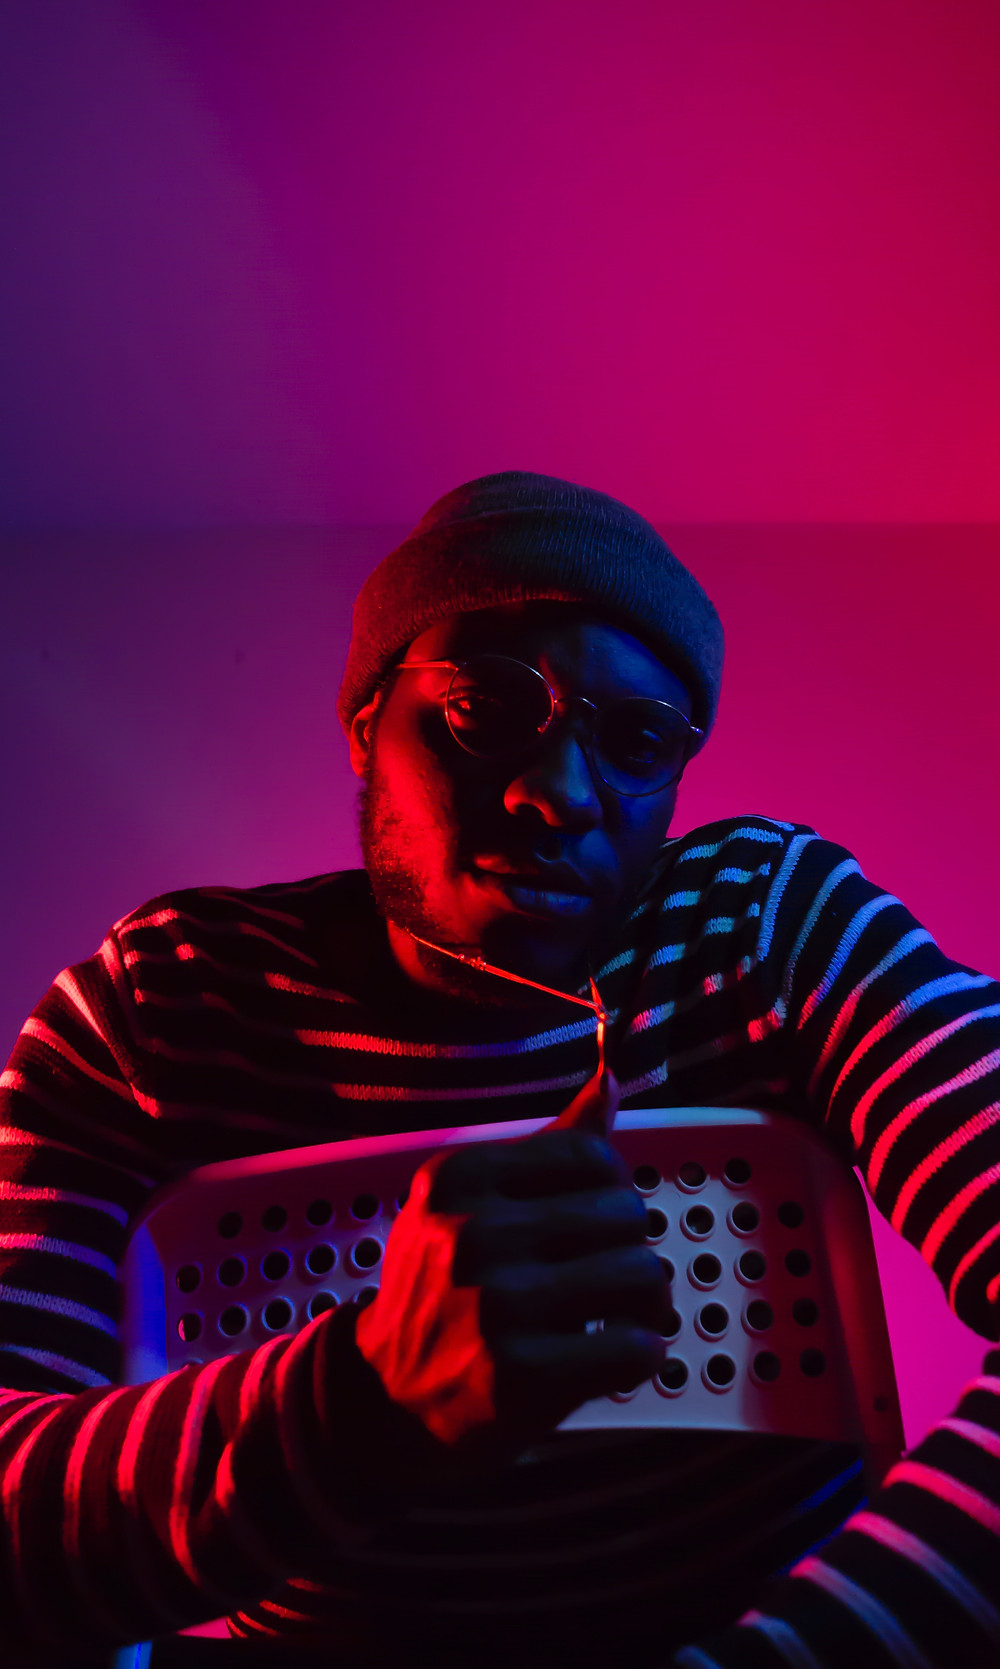 black male model in red neon lighting